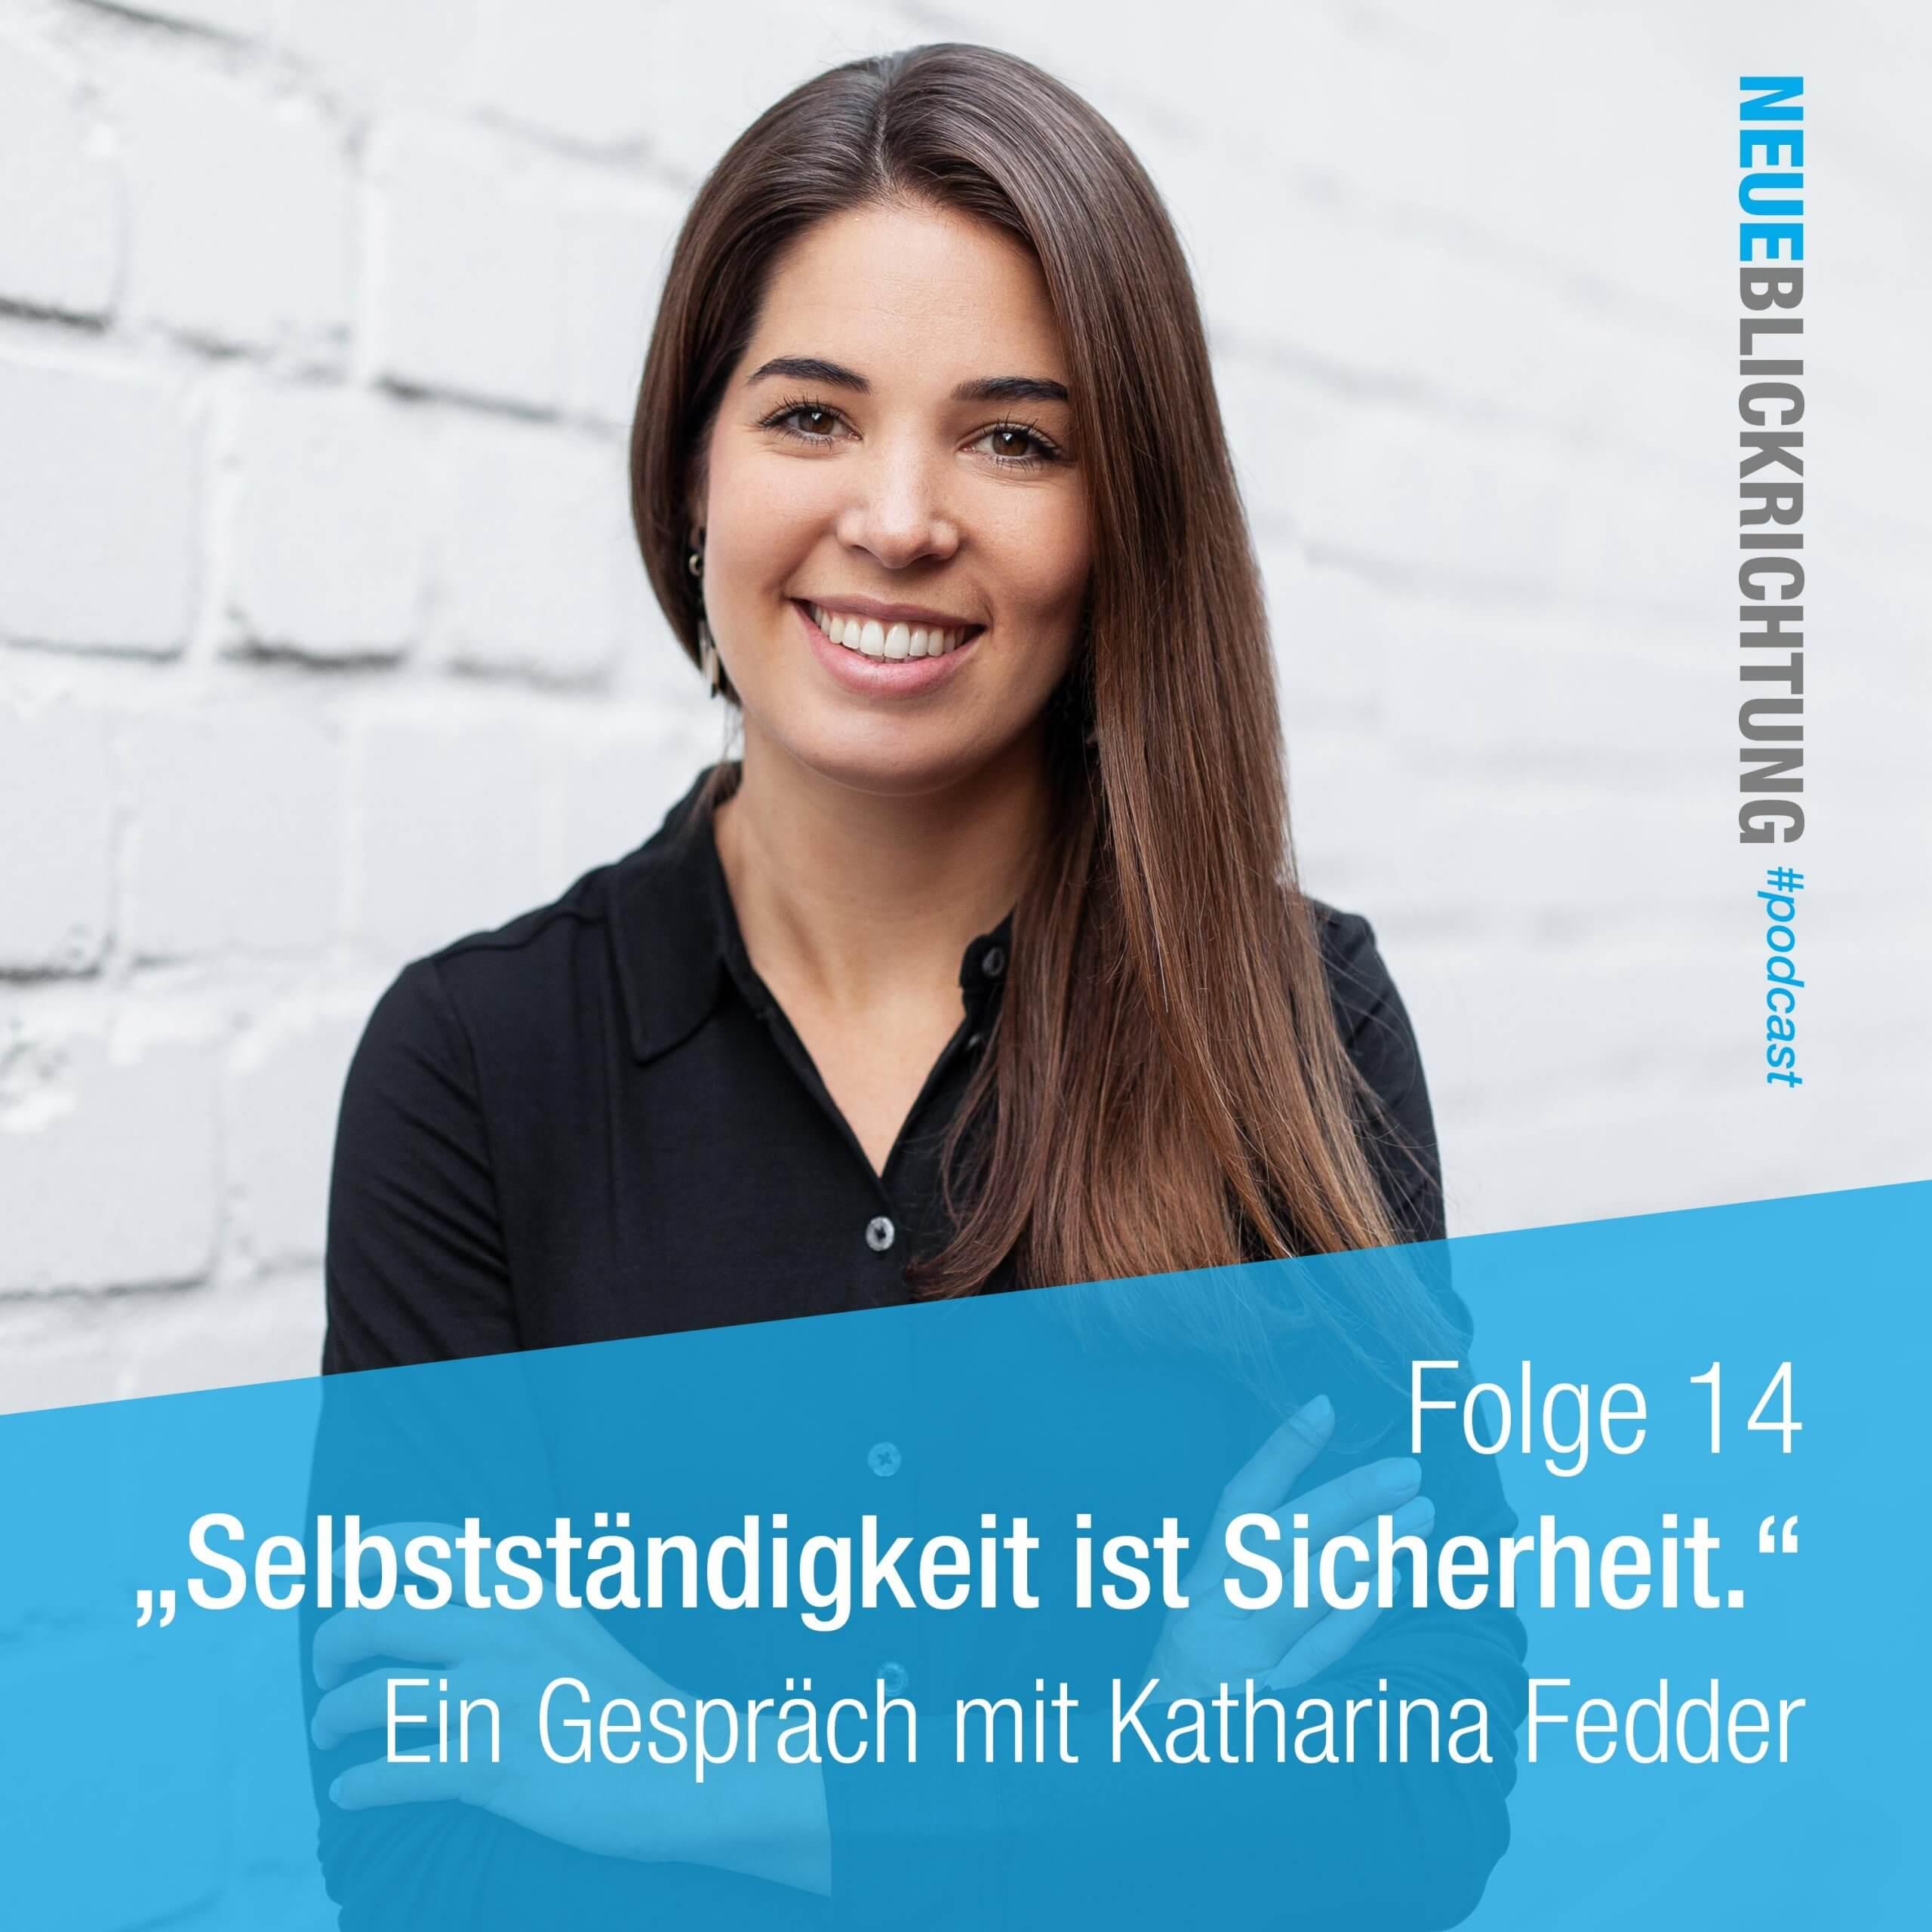 Katharina Fedder